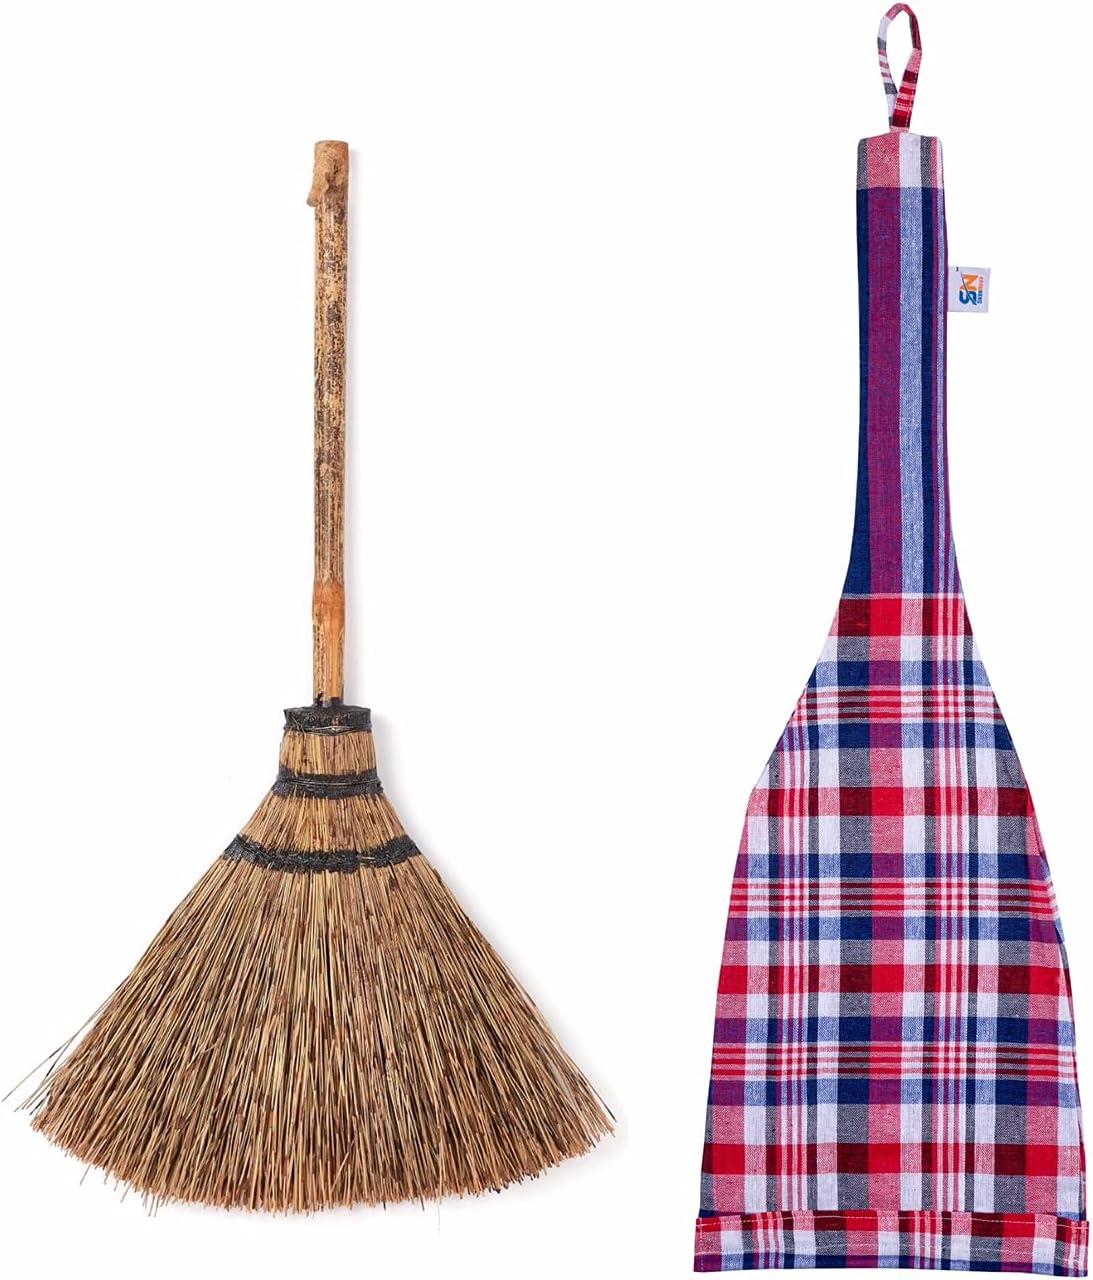 Skennova - 29 inch Tall of Elephant Eyelash Brown Grass Broom Bamboo Stick with Natural Hanger Handle Thai Broom Asian Broom